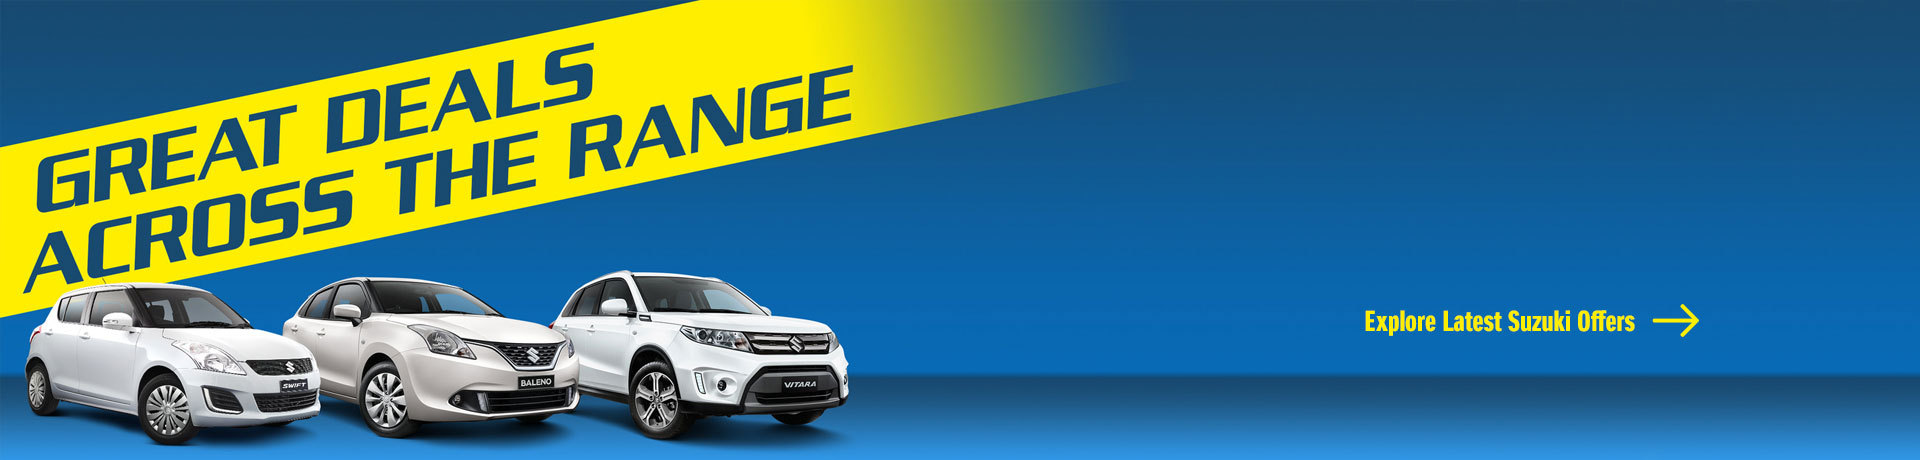 Suzuki - National Offer - Great Deals Across The Range